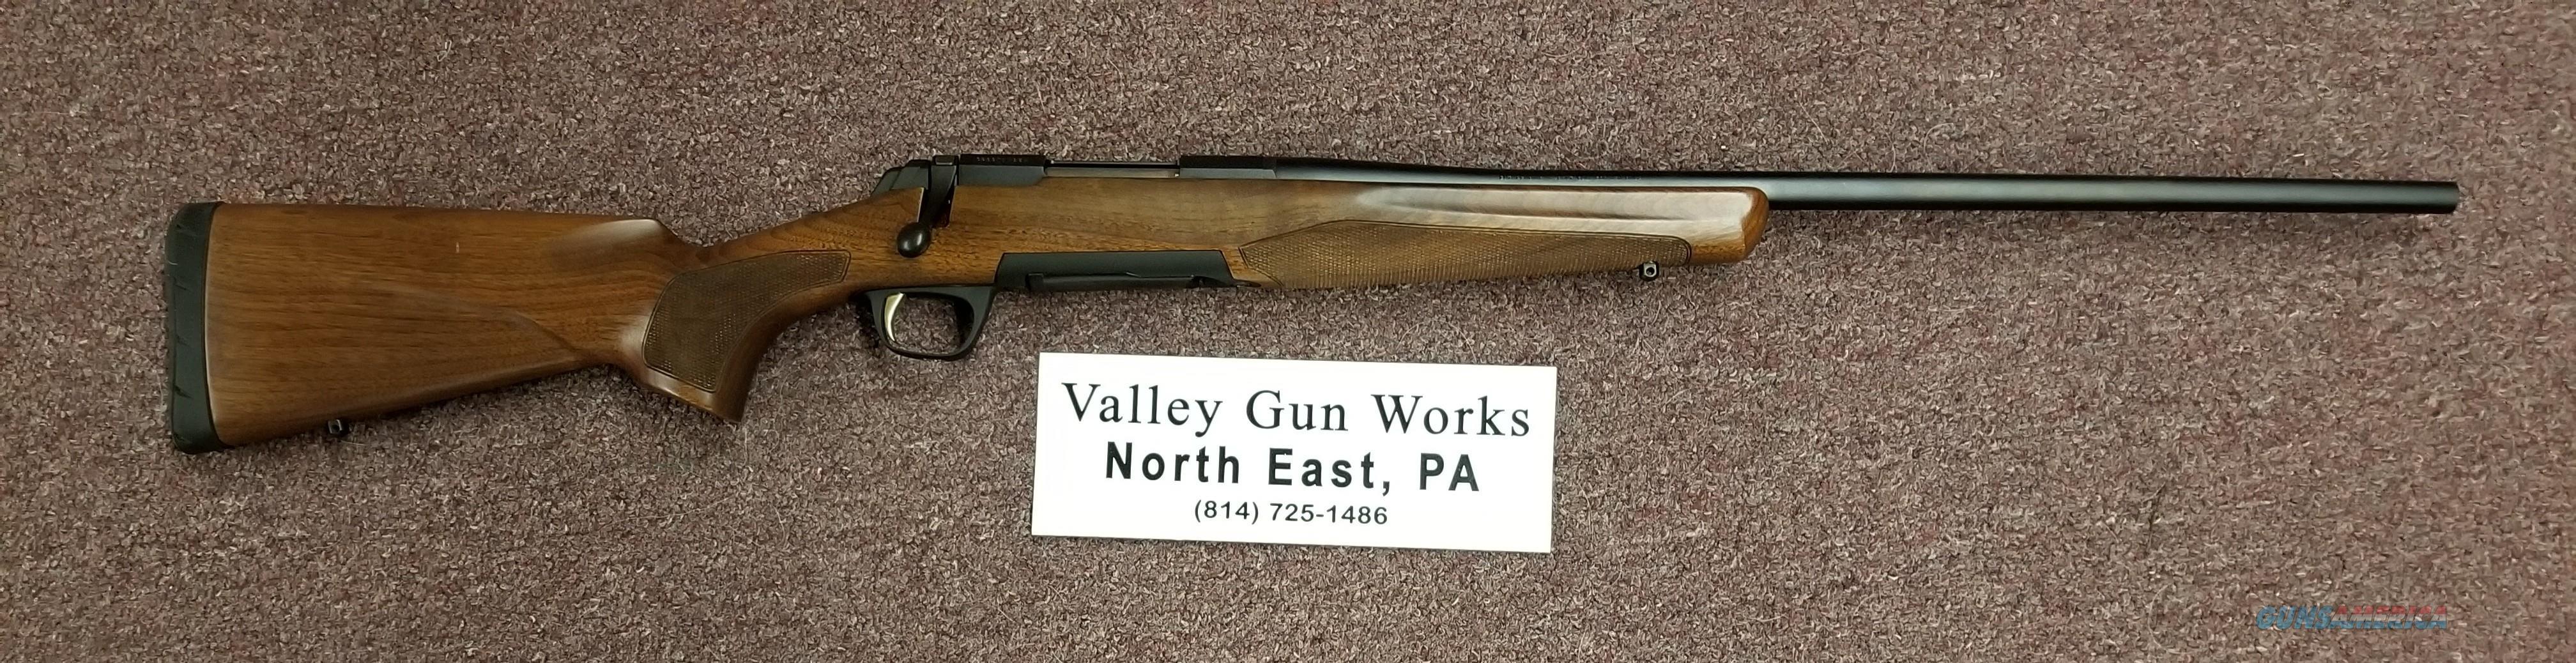 Browning X-Bolt - 300 WSM - NIB - Free Shipping  Guns > Rifles > Browning Rifles > Bolt Action > Hunting > Blue